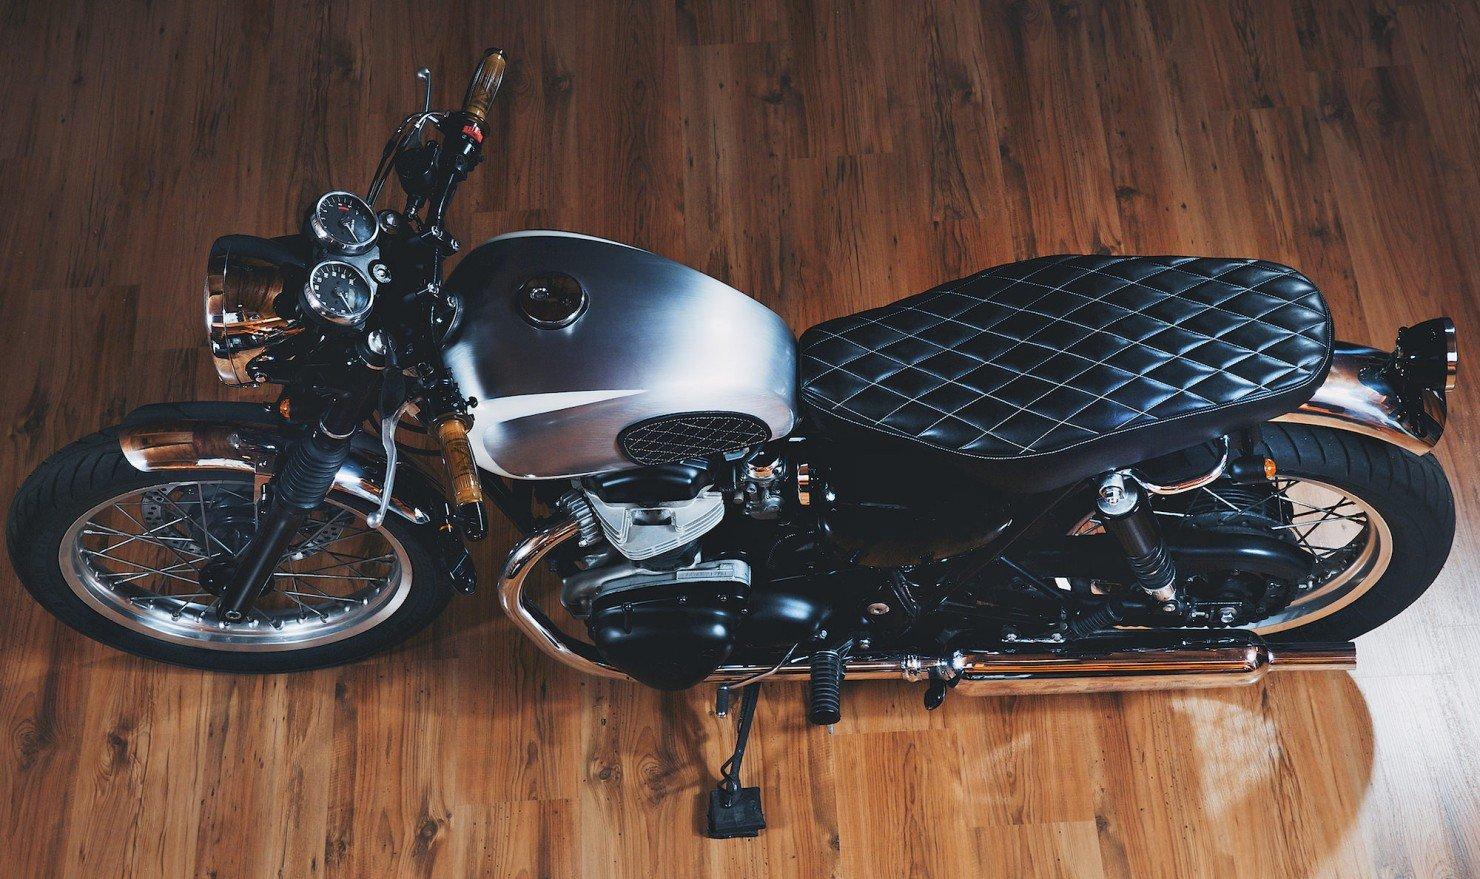 Kawasaki W650 Motorcycle 17 1480x879 Kawasaki W650